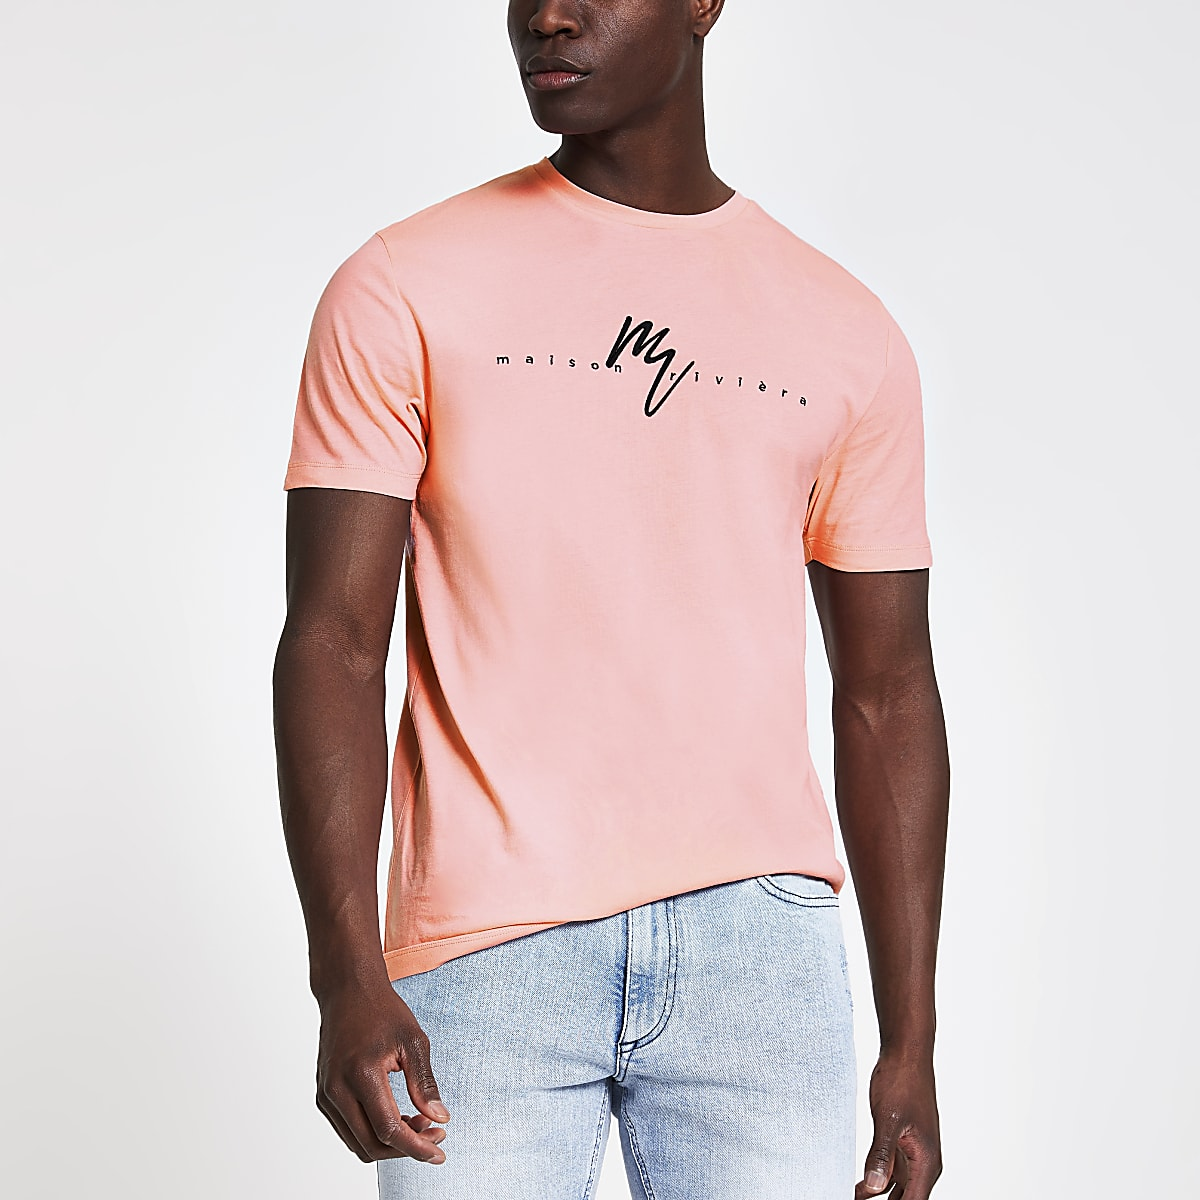 Maison Riviera - Koraalrood slim-fit T-shirt